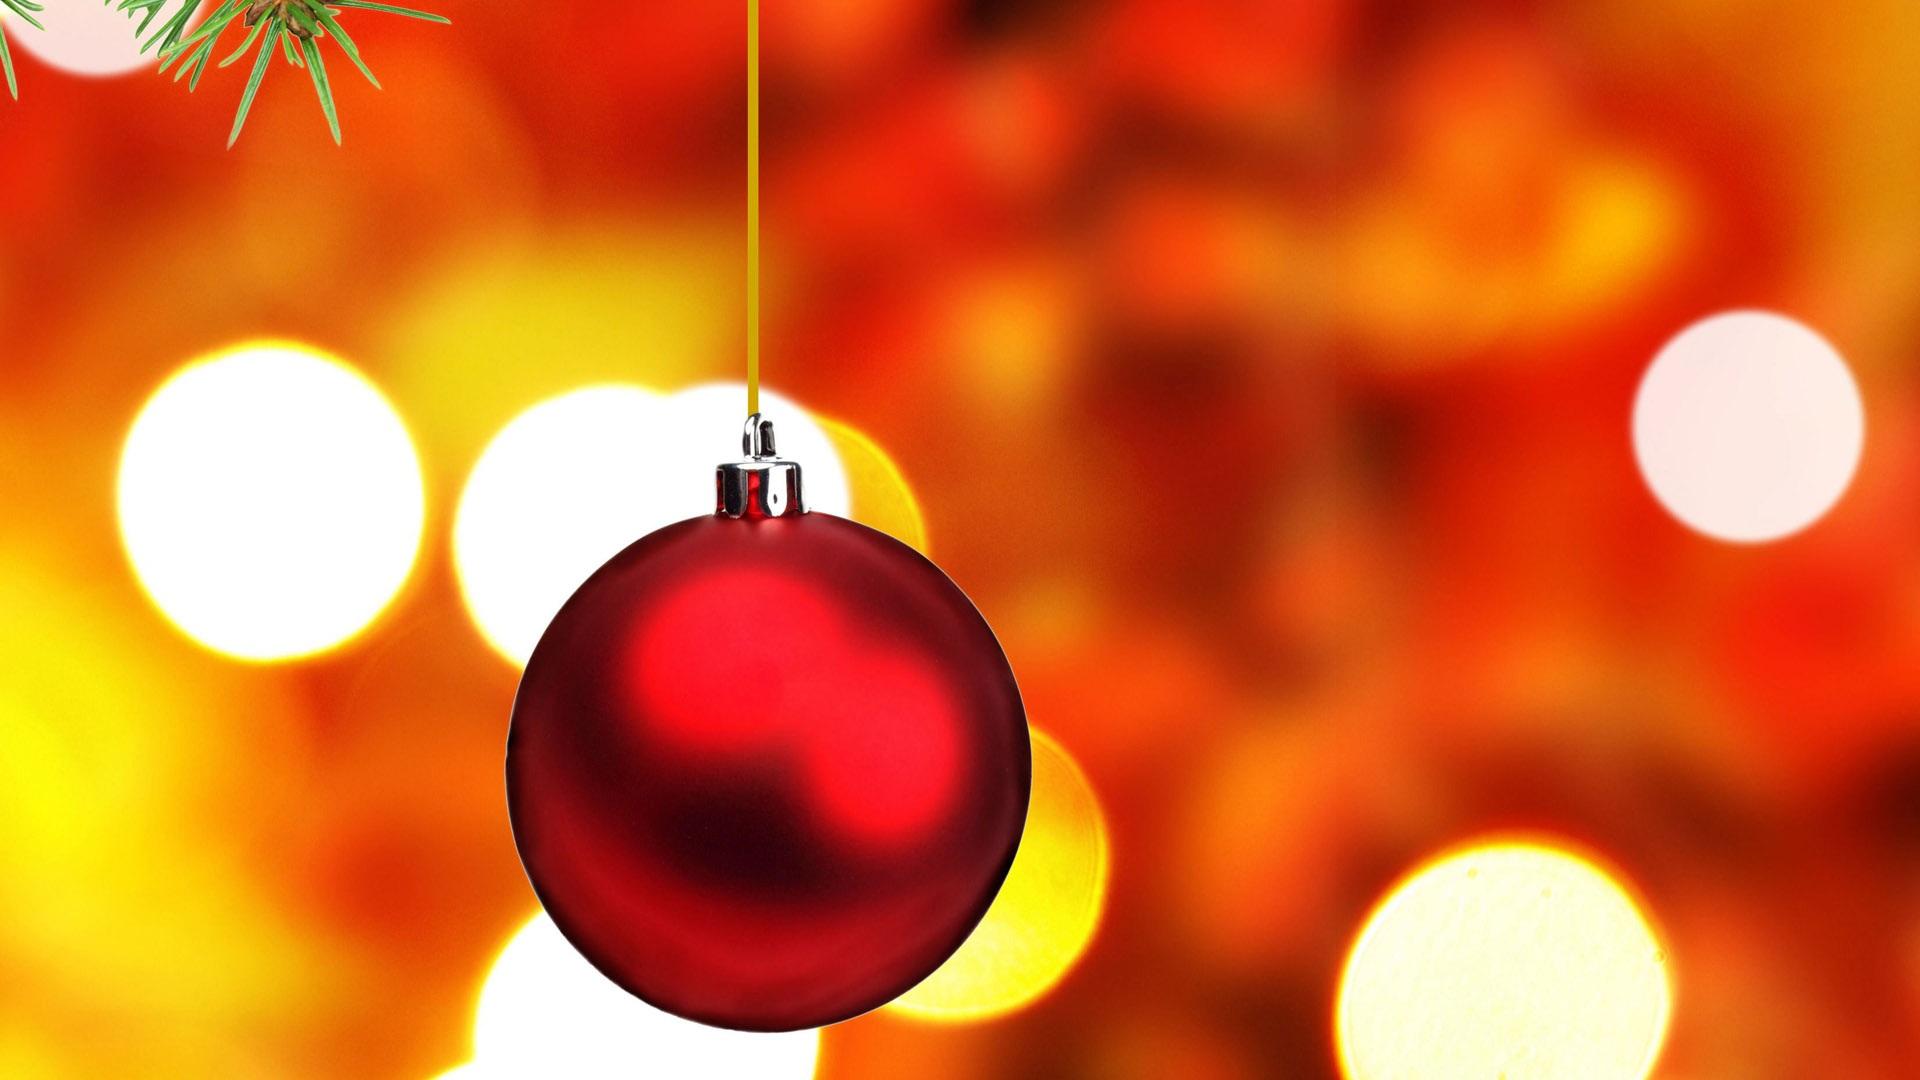 red bola de navidad x full hd